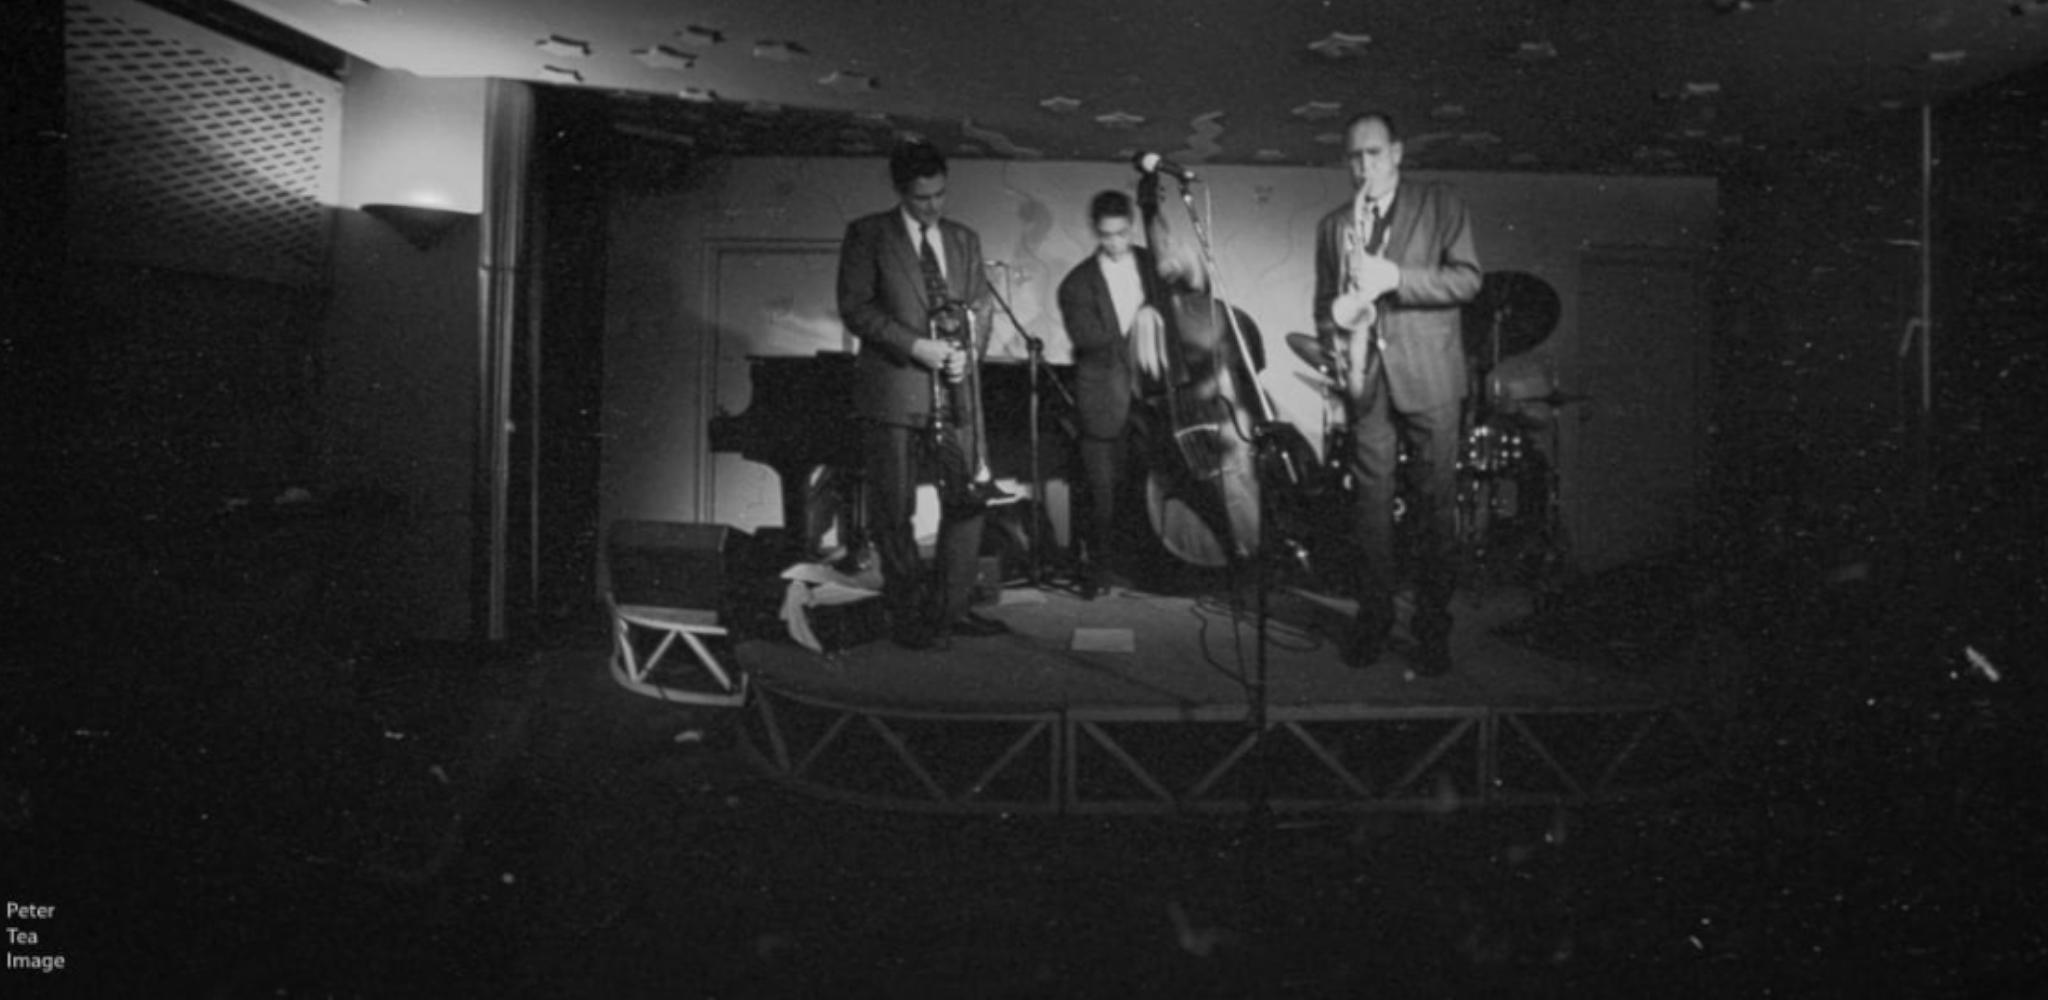 Three musicians on cargo club stage peter tea image